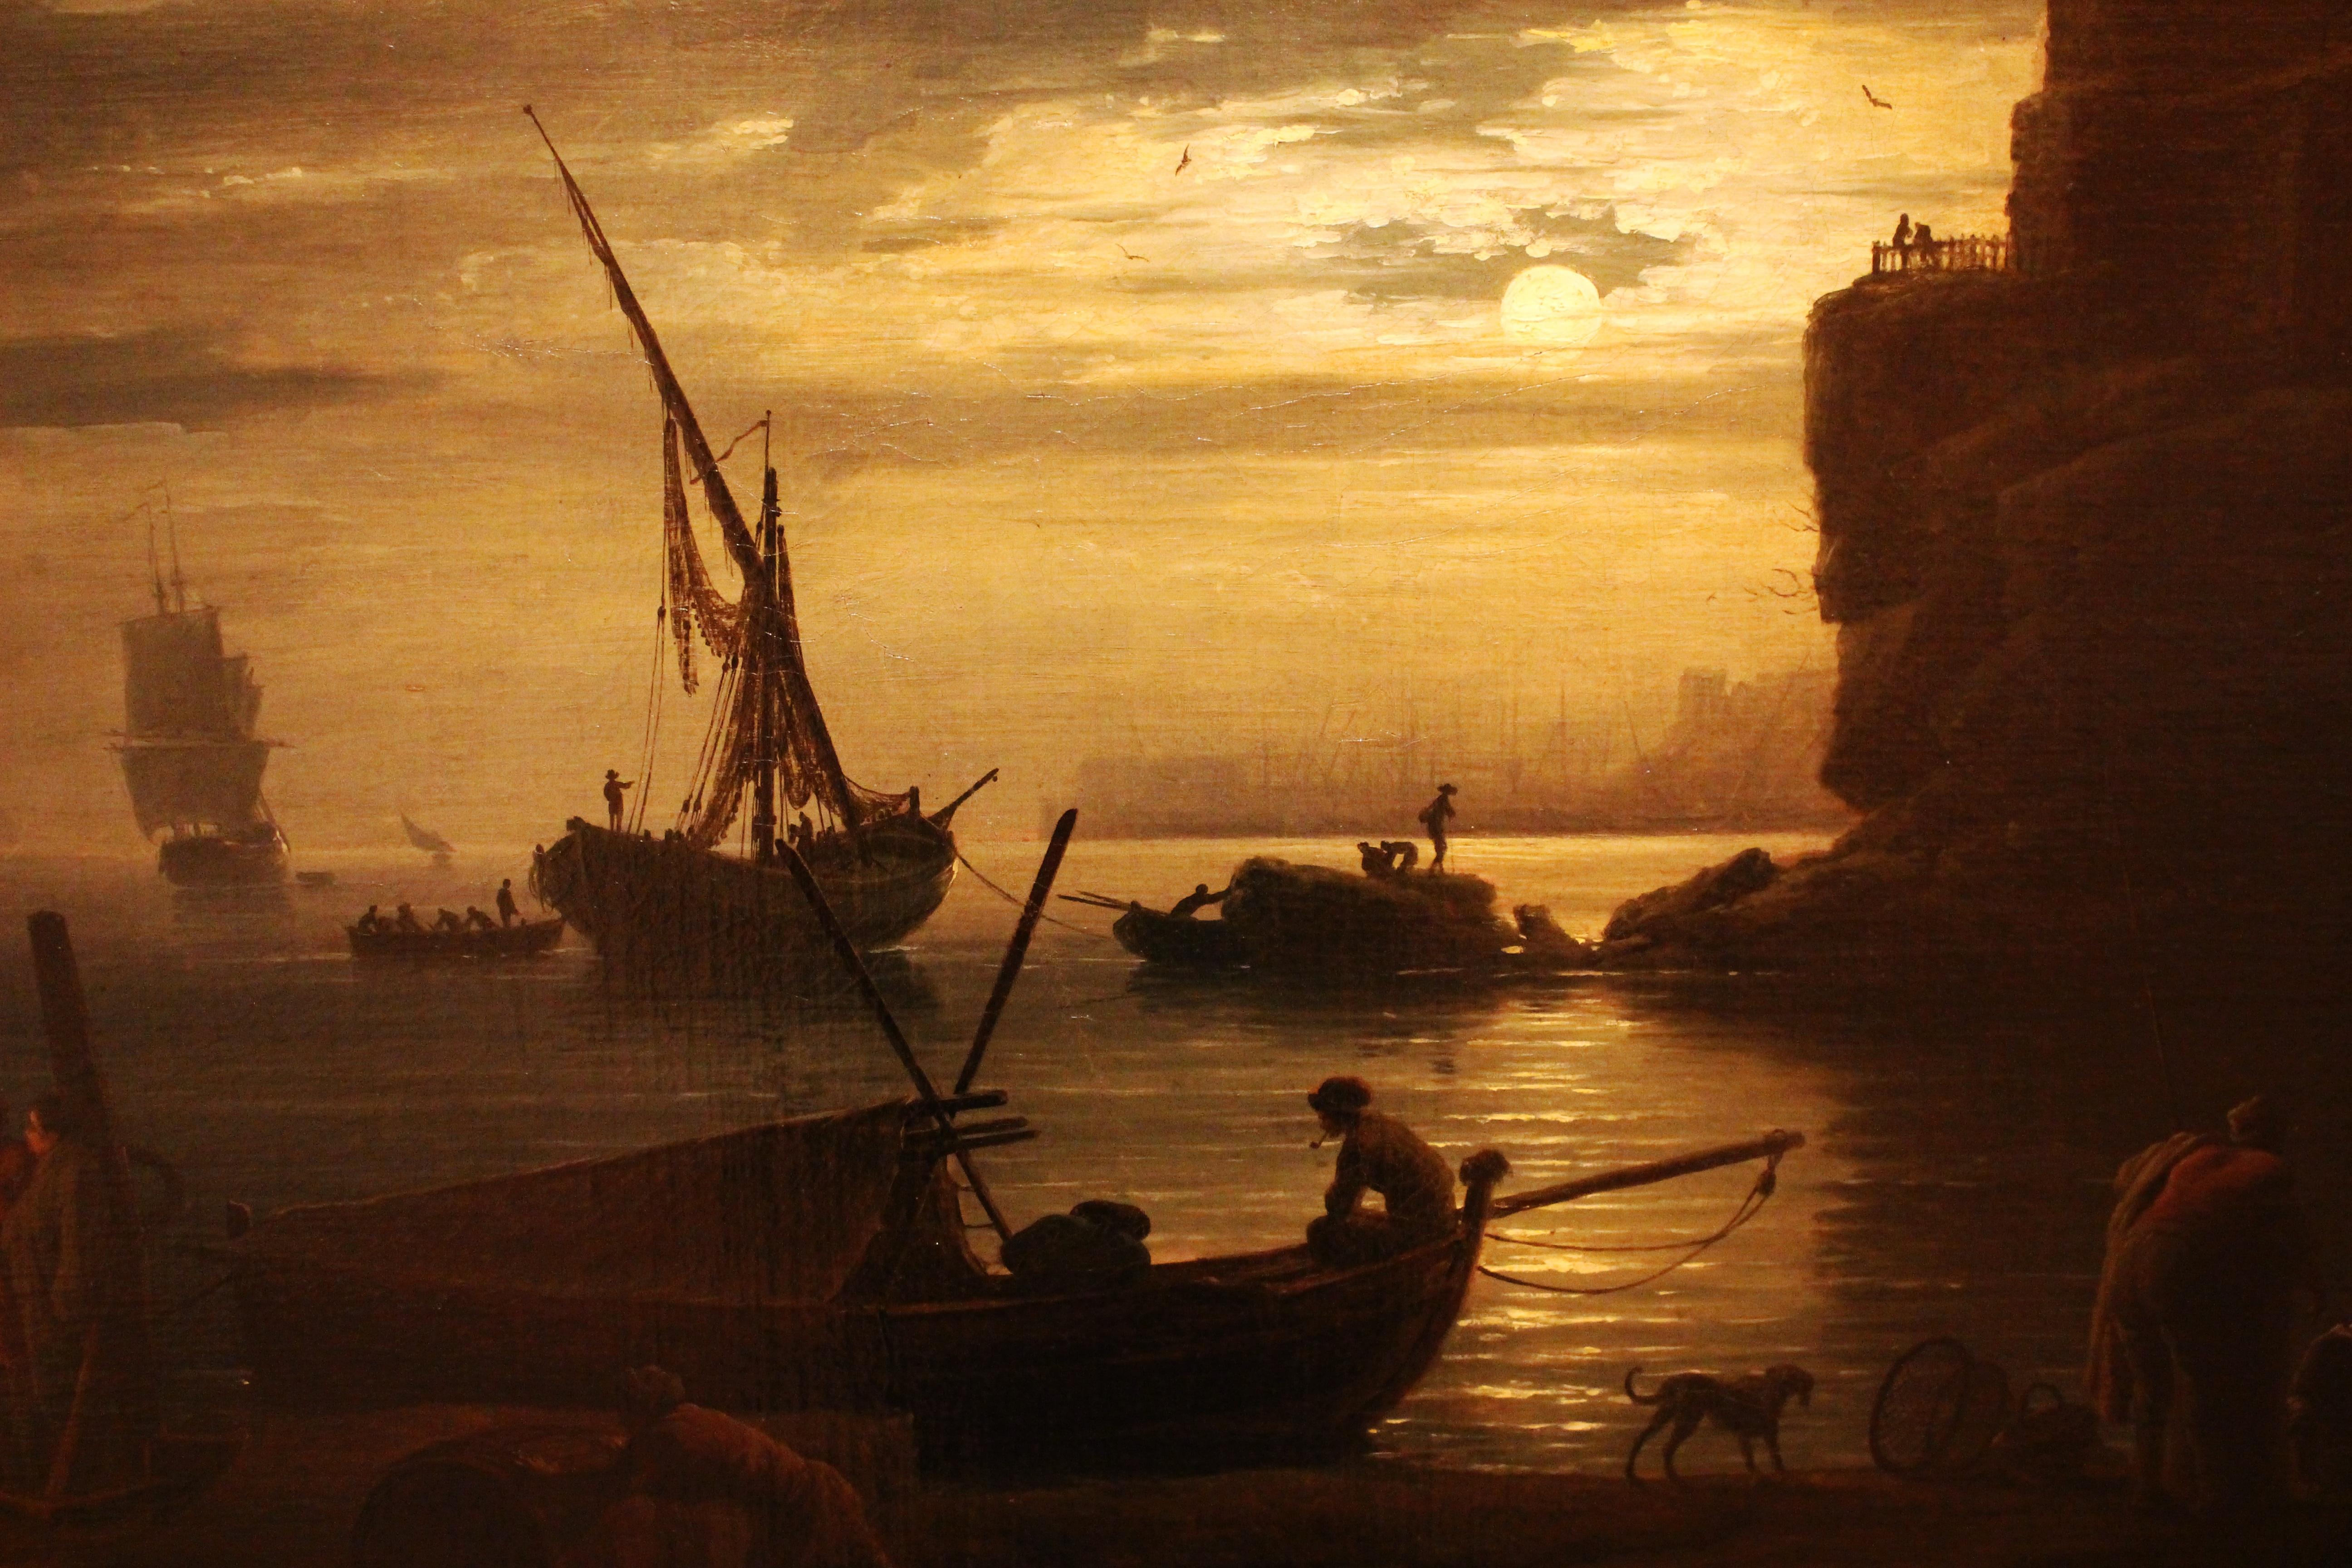 Gambar Pemandangan Laut Pantai Horison Matahari Terbit